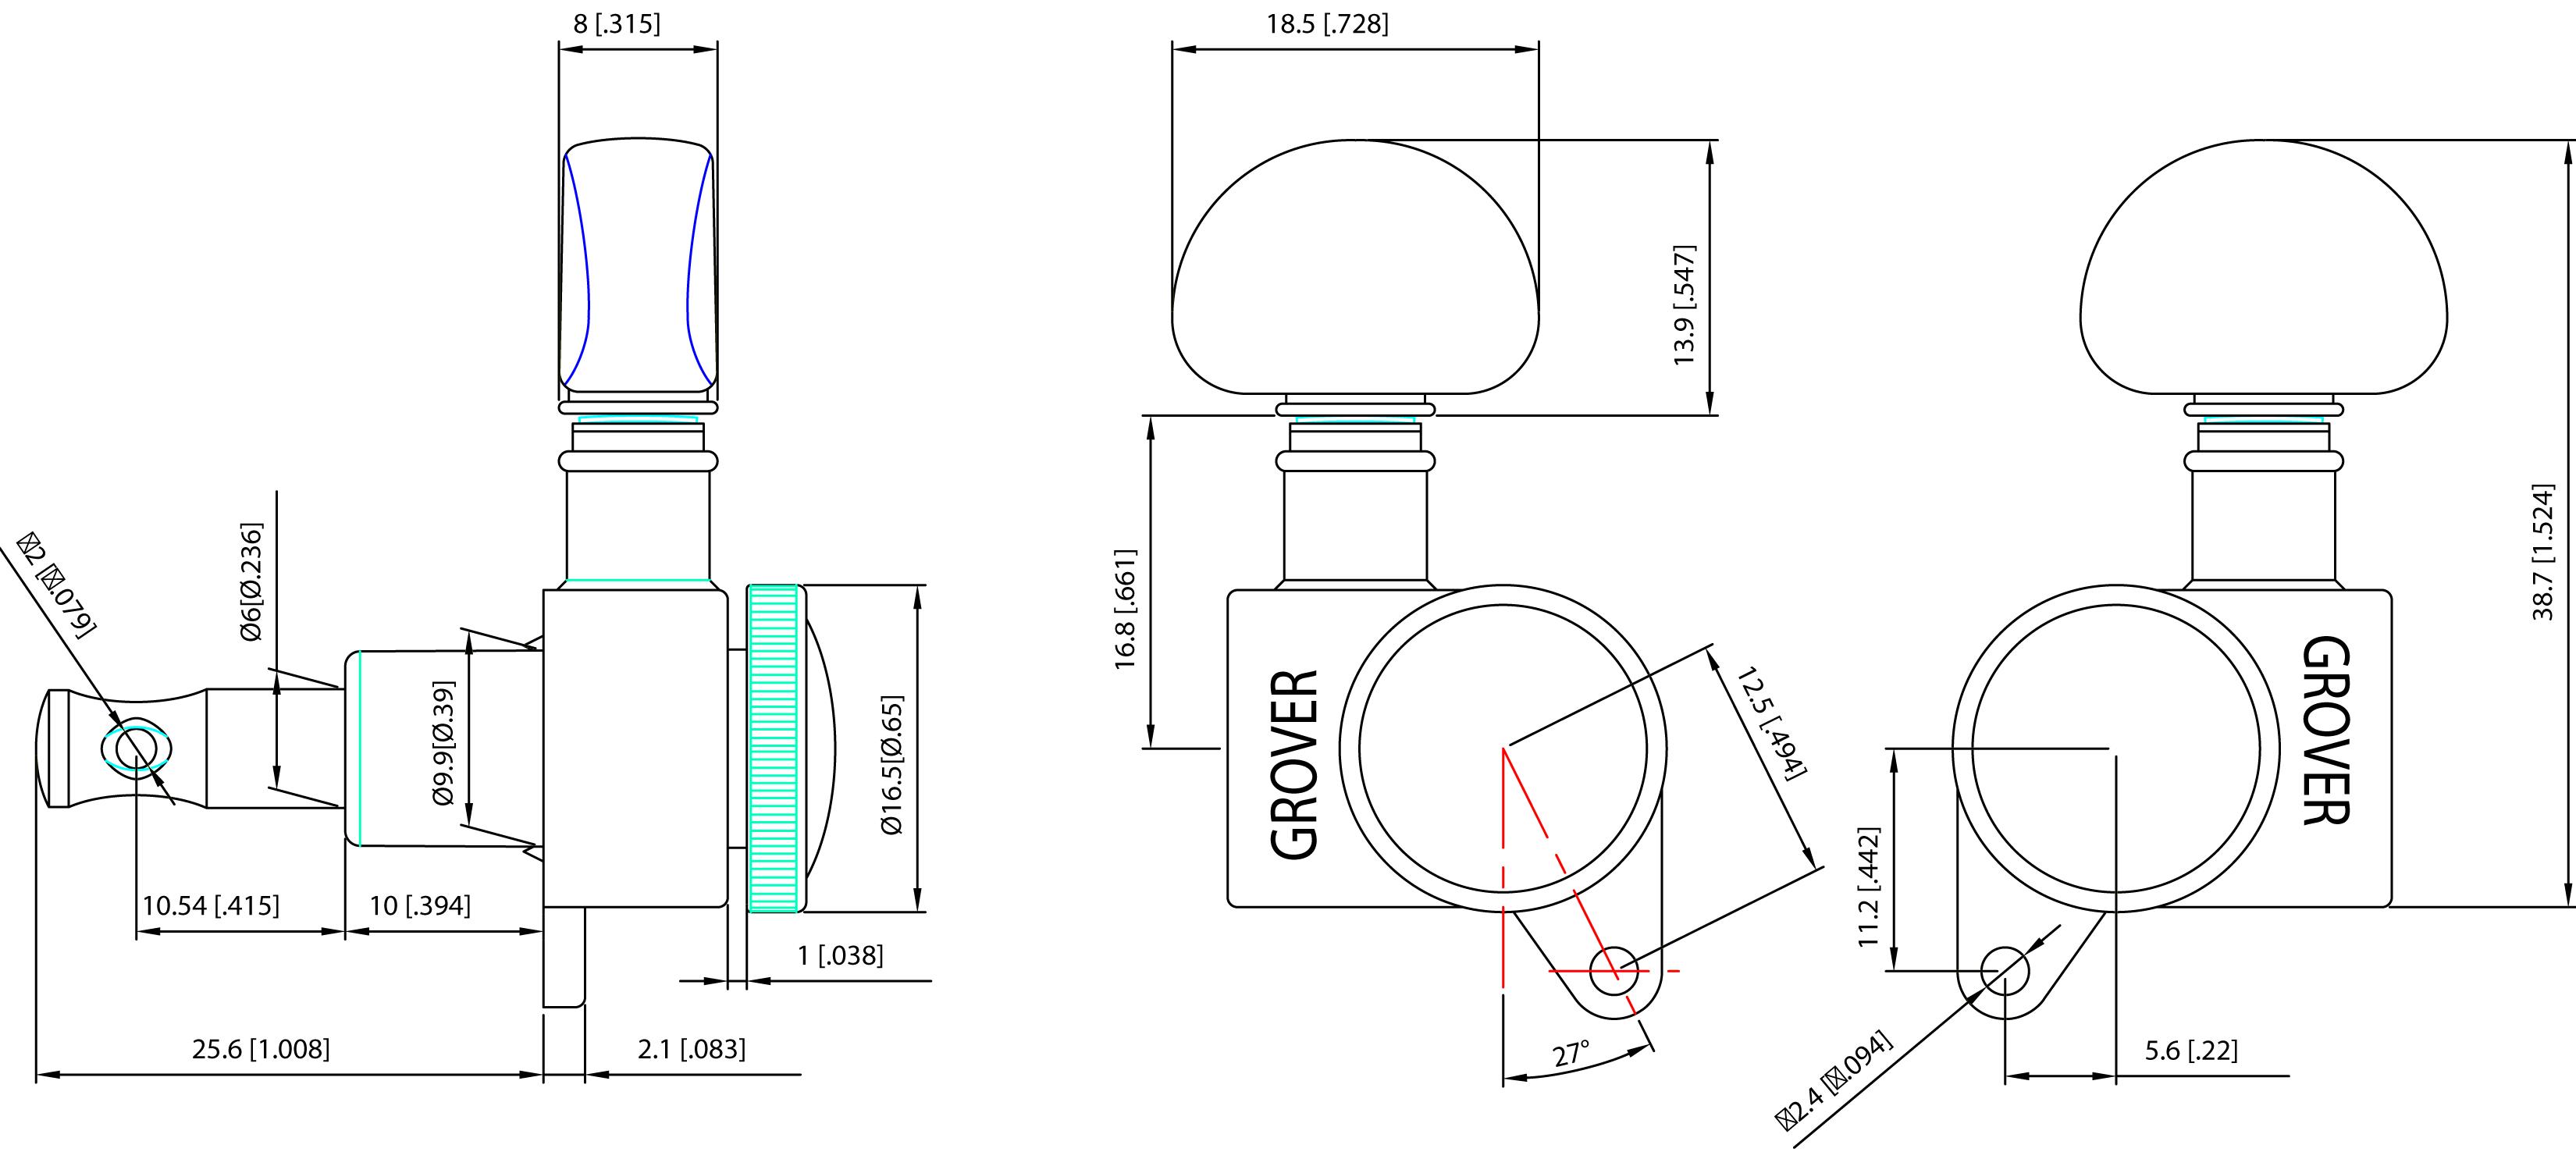 Genuine Grover 505g6 Mini Roto Grip Locking Rotomatic 6